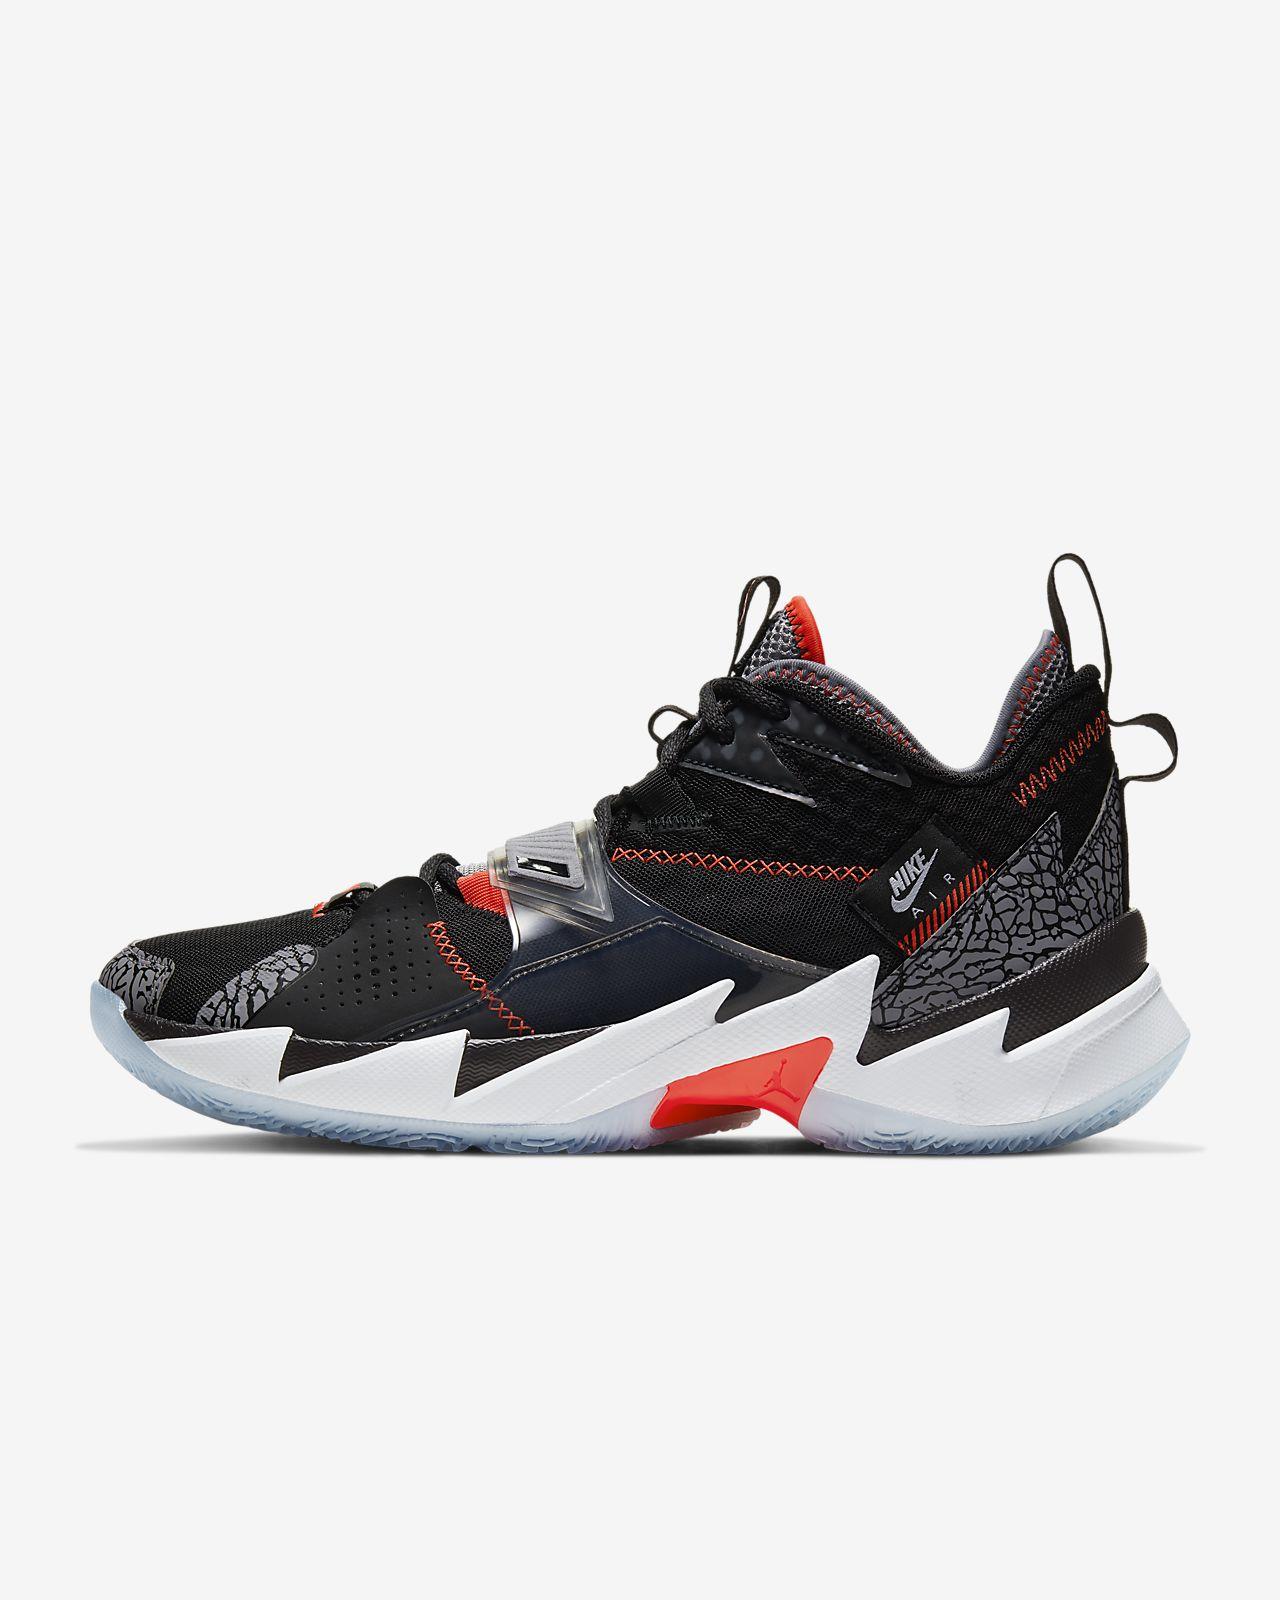 Jordan 'Why Not?' Zer0.3 Basketball Shoe